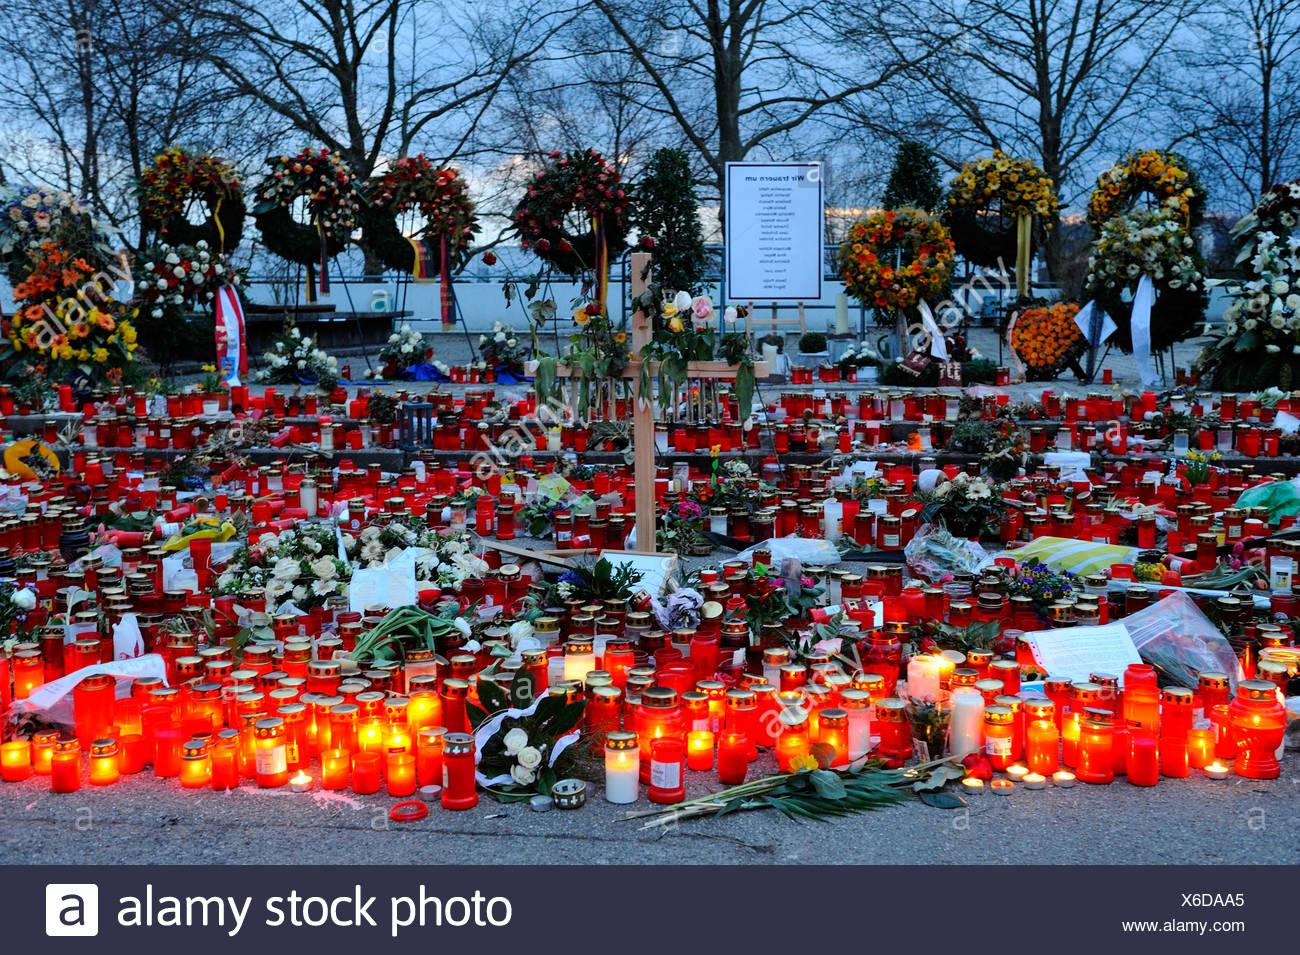 Killing spree, Albertville Realschule school, memorial site, Winnenden, Baden-Wuerttemberg, Germany, Europe - Stock Image